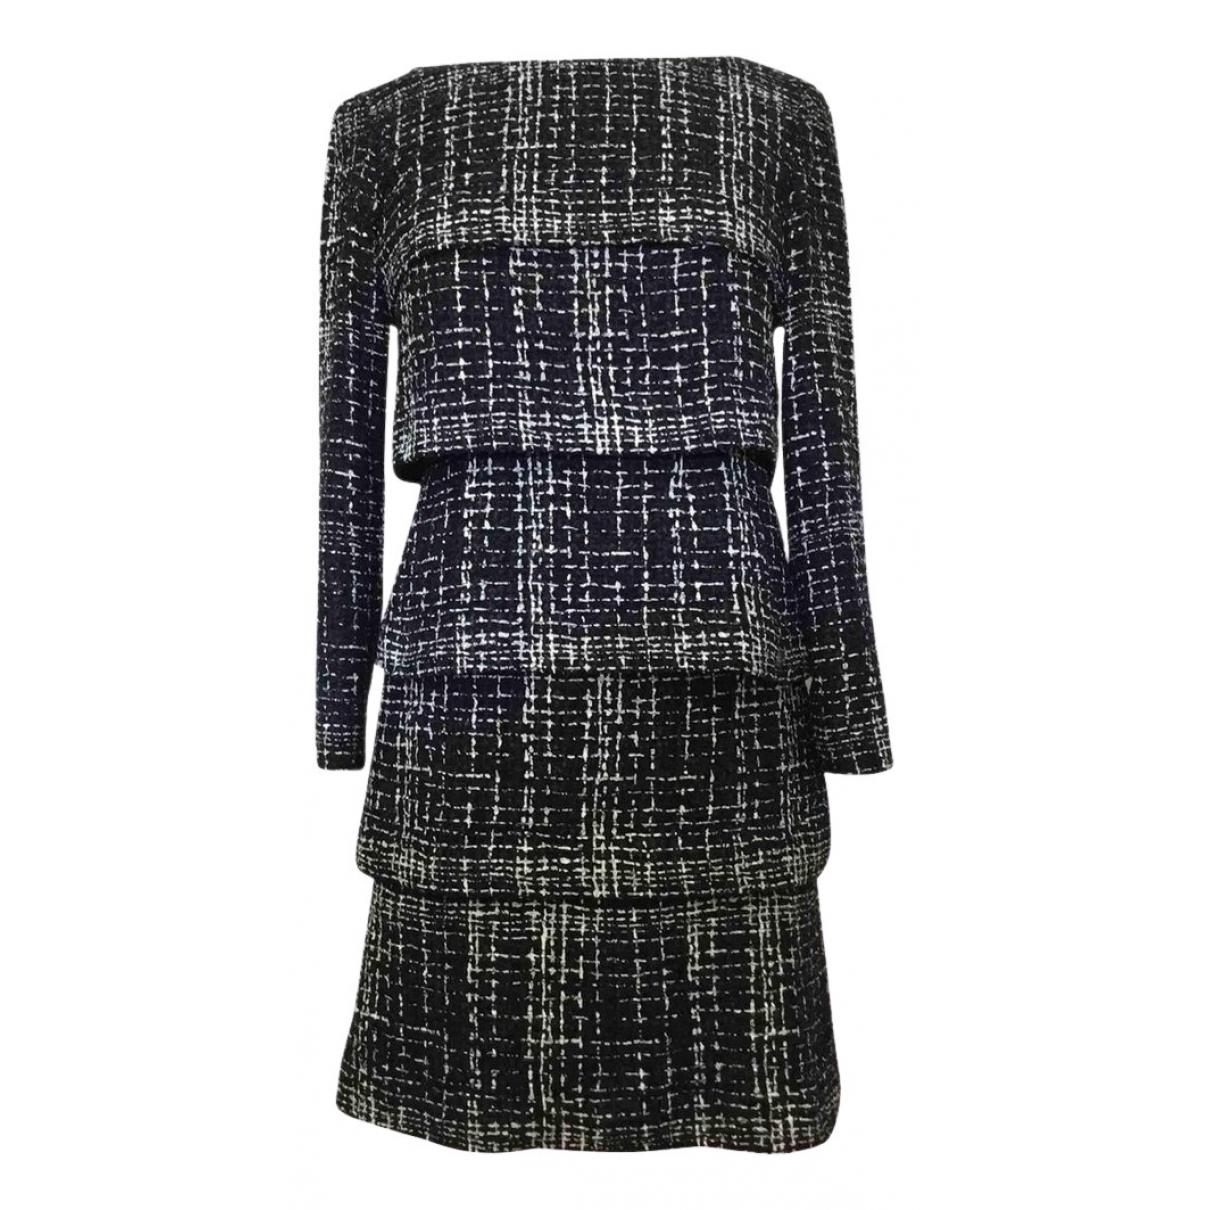 Chanel \N Blue Tweed dress for Women 34 FR